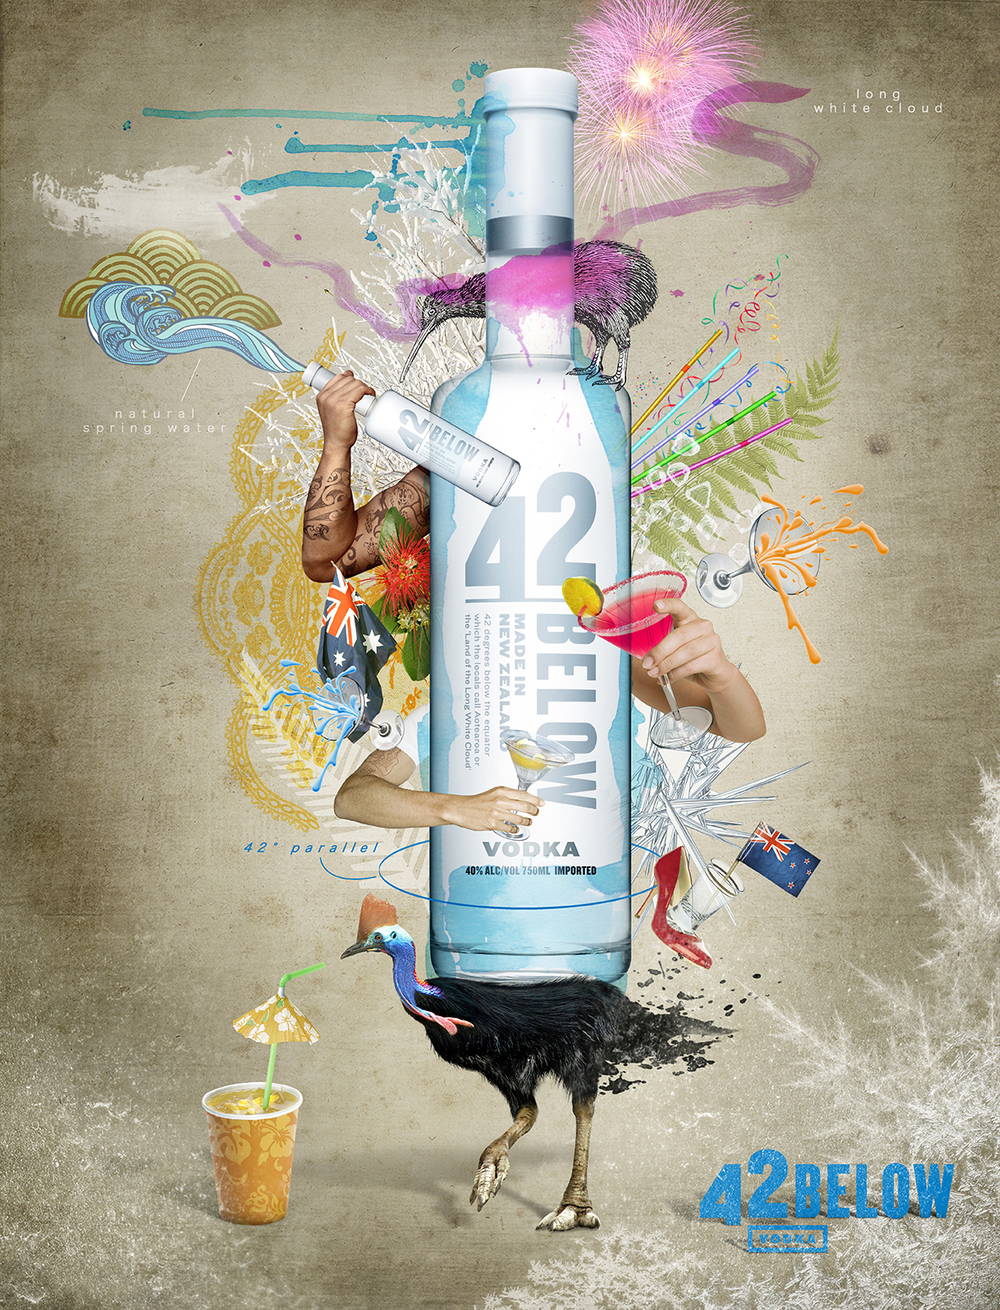 42Below Vodka